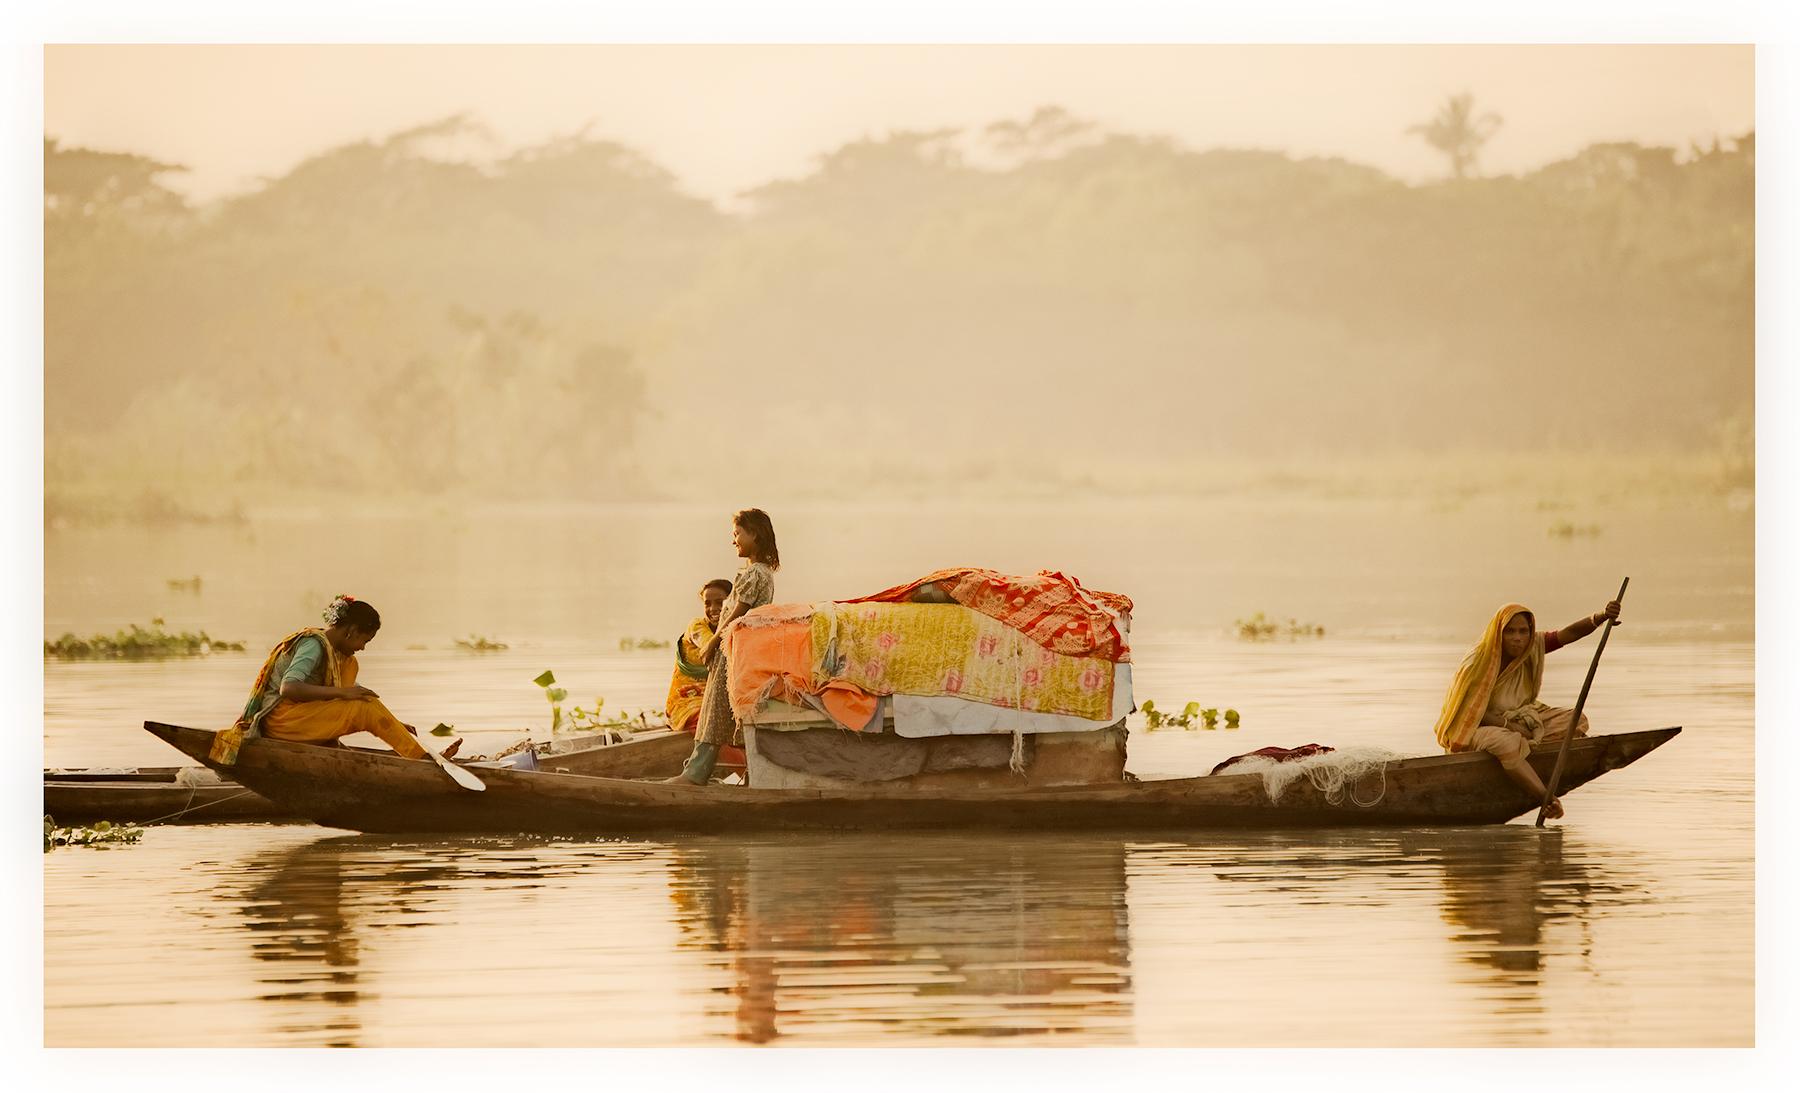 Women on boats, Bangladesh